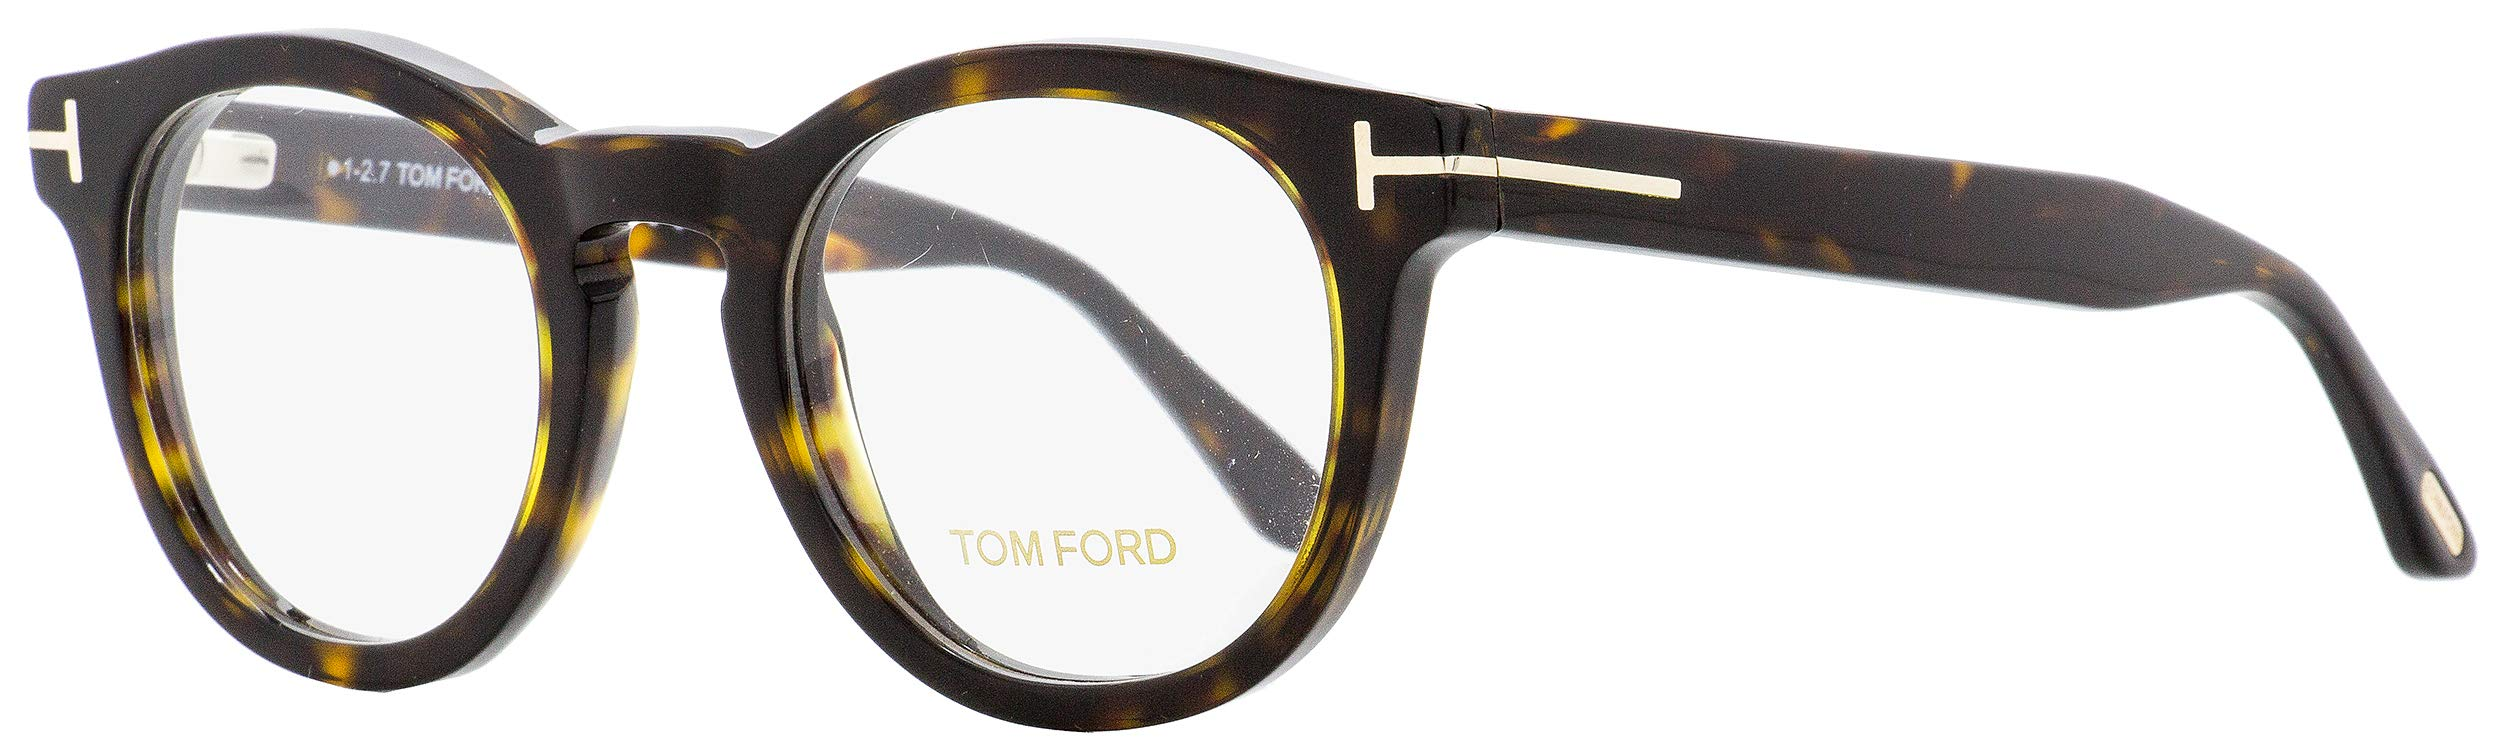 Tom Ford FT5489 Eyeglasses (052 - Dark Havana) by Tom Ford